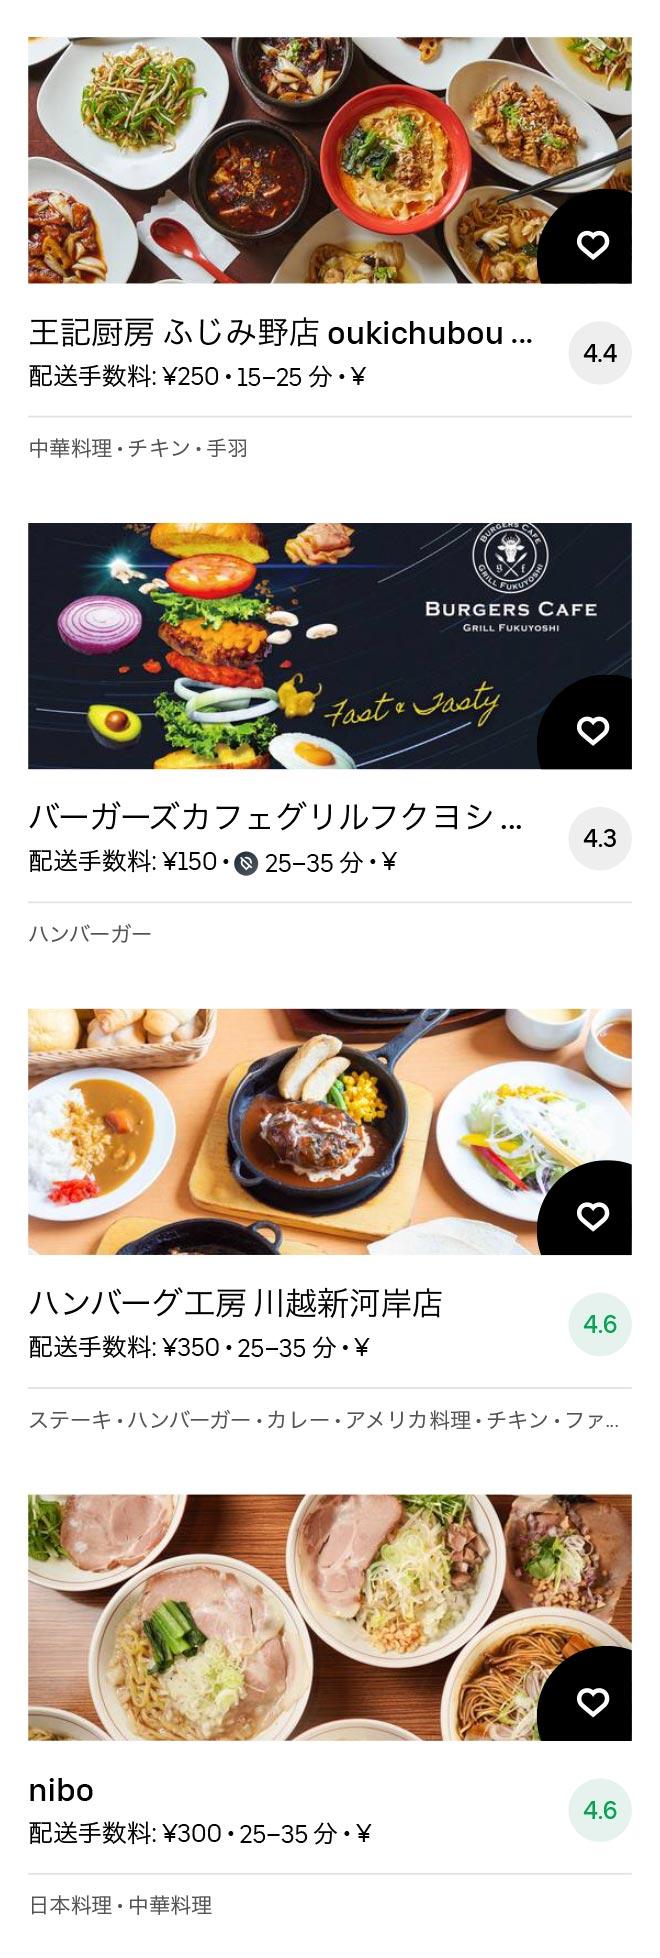 Kamifukuoka menu 2011 10